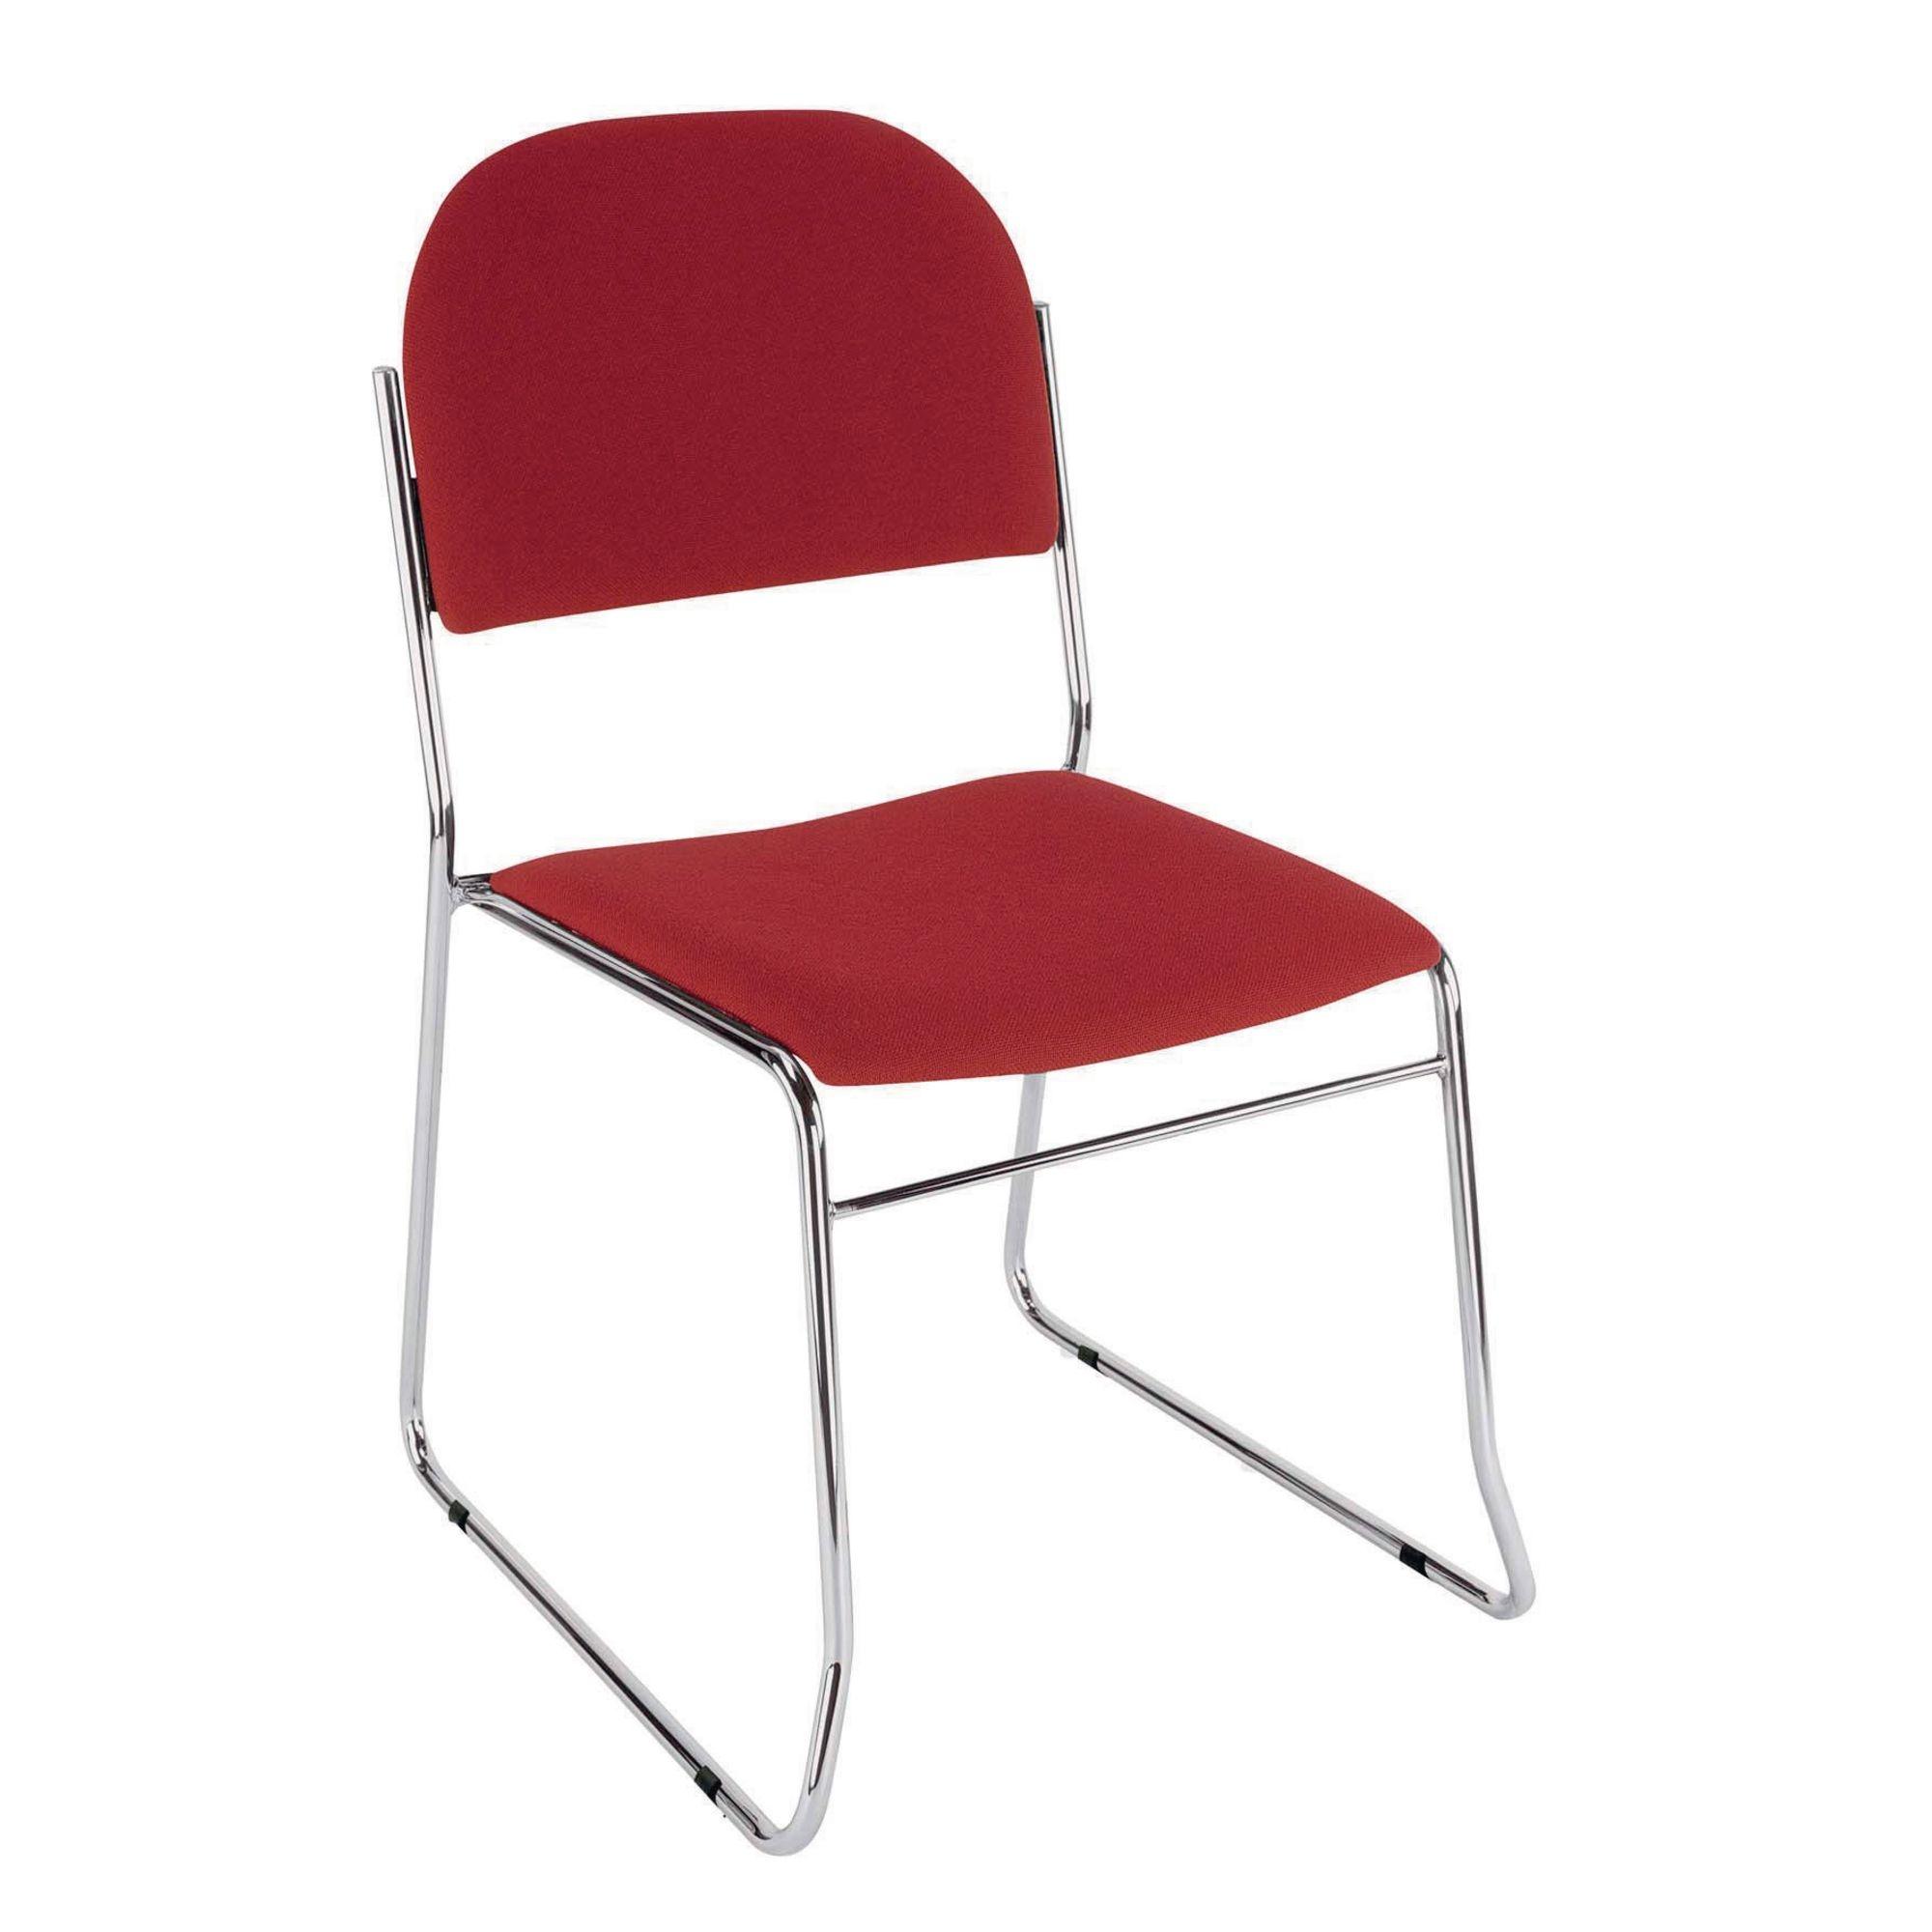 Classmates Skidbase Stacking Chair Burgundy